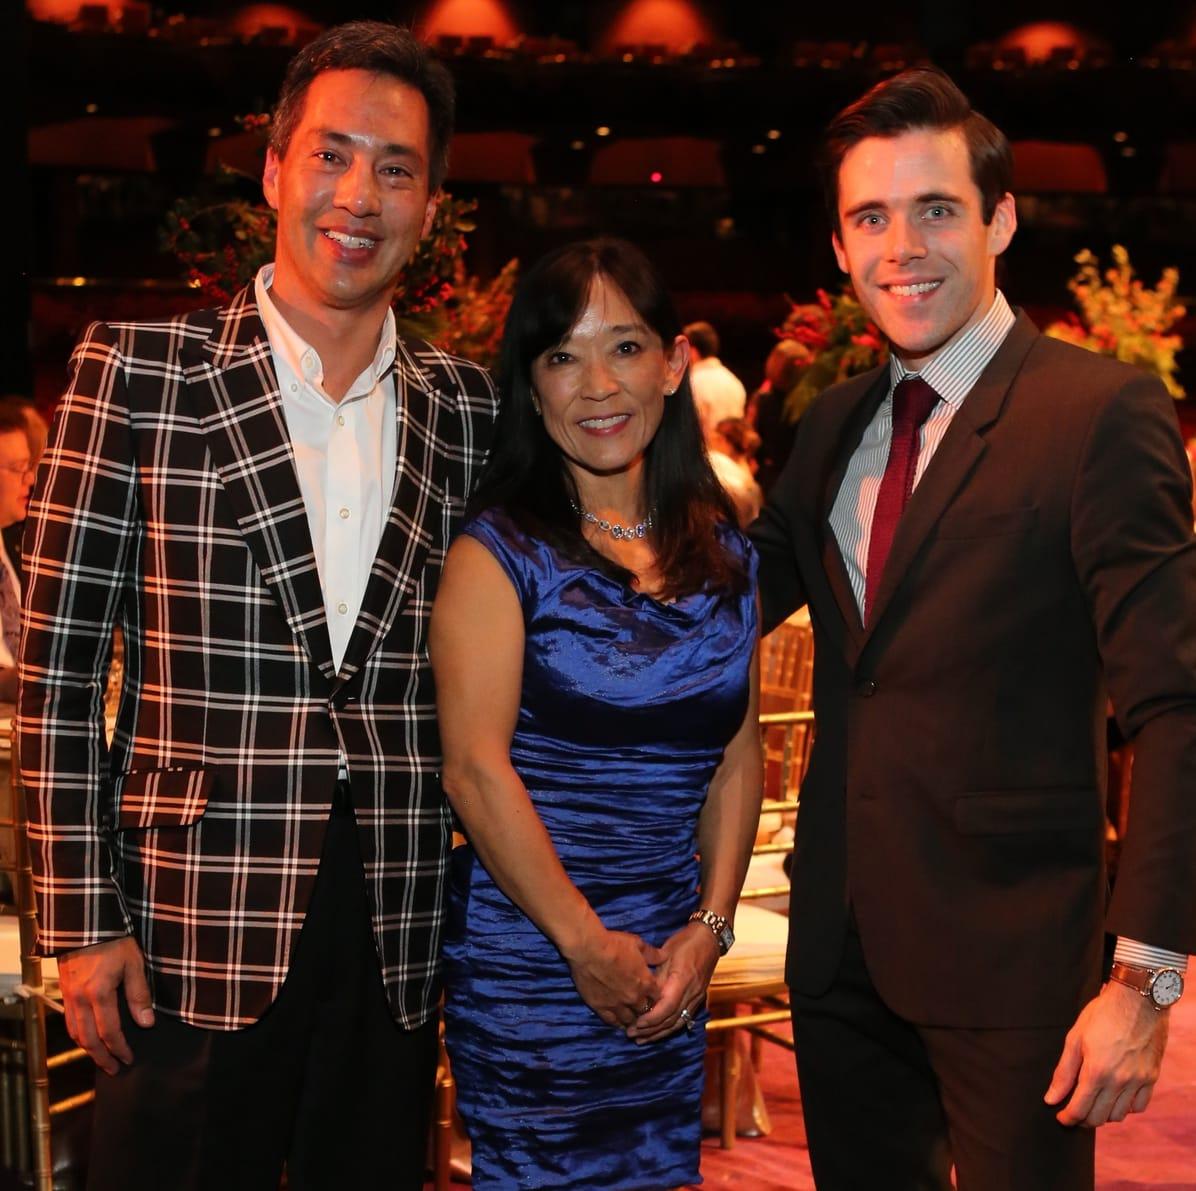 News, Houston Ballet Jubilee of Dance, Dec. 2015, Pierre Chevray, Kay Chevray, Connor Walsh